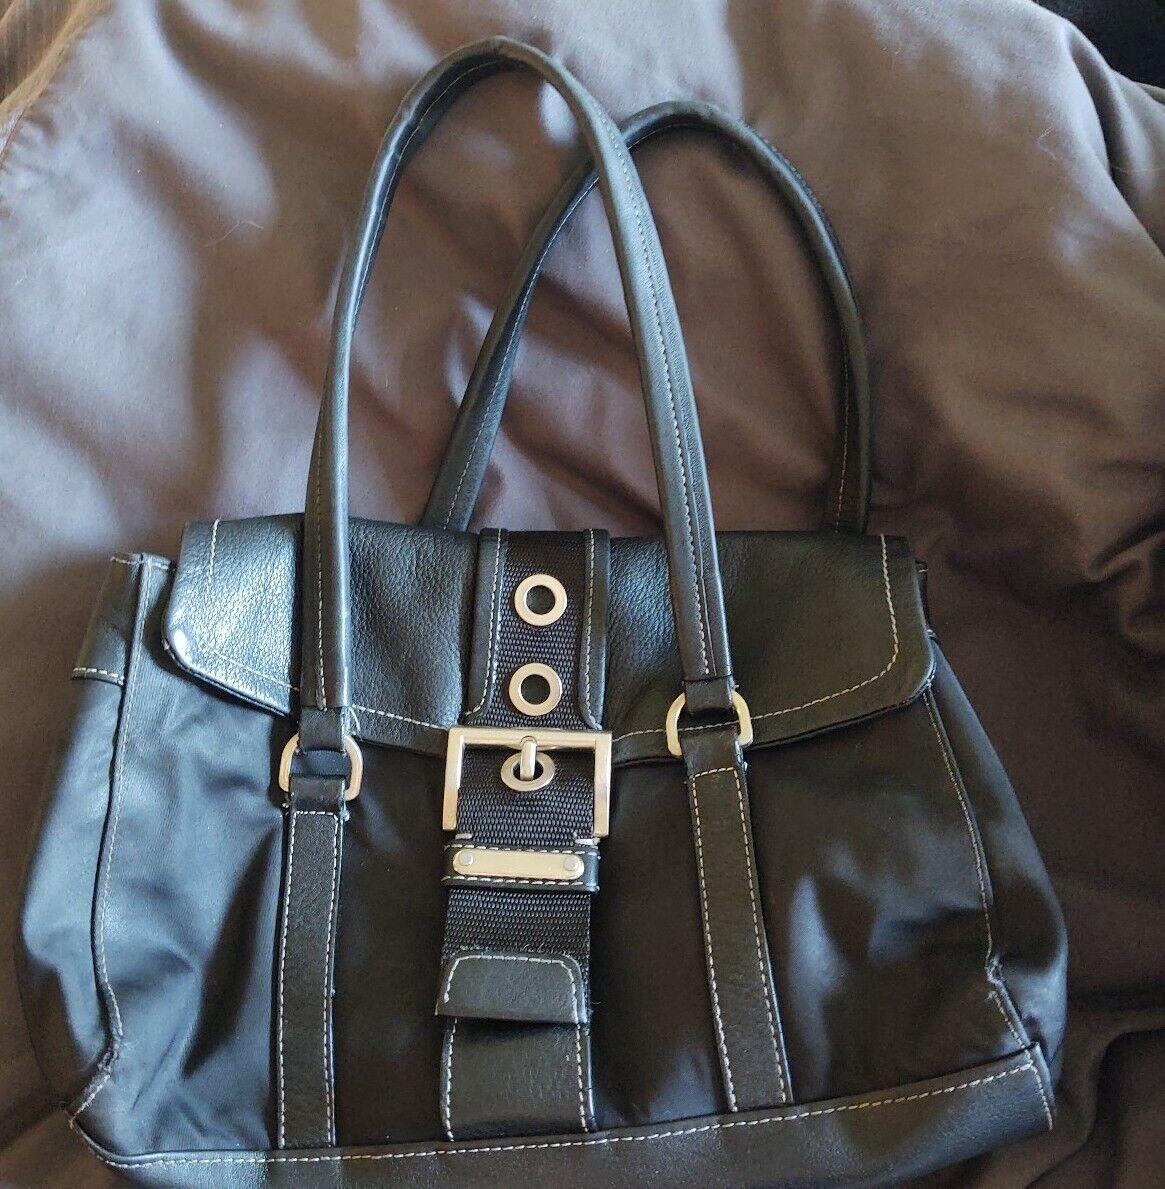 Prada Vintage 90's Handbag - image 1